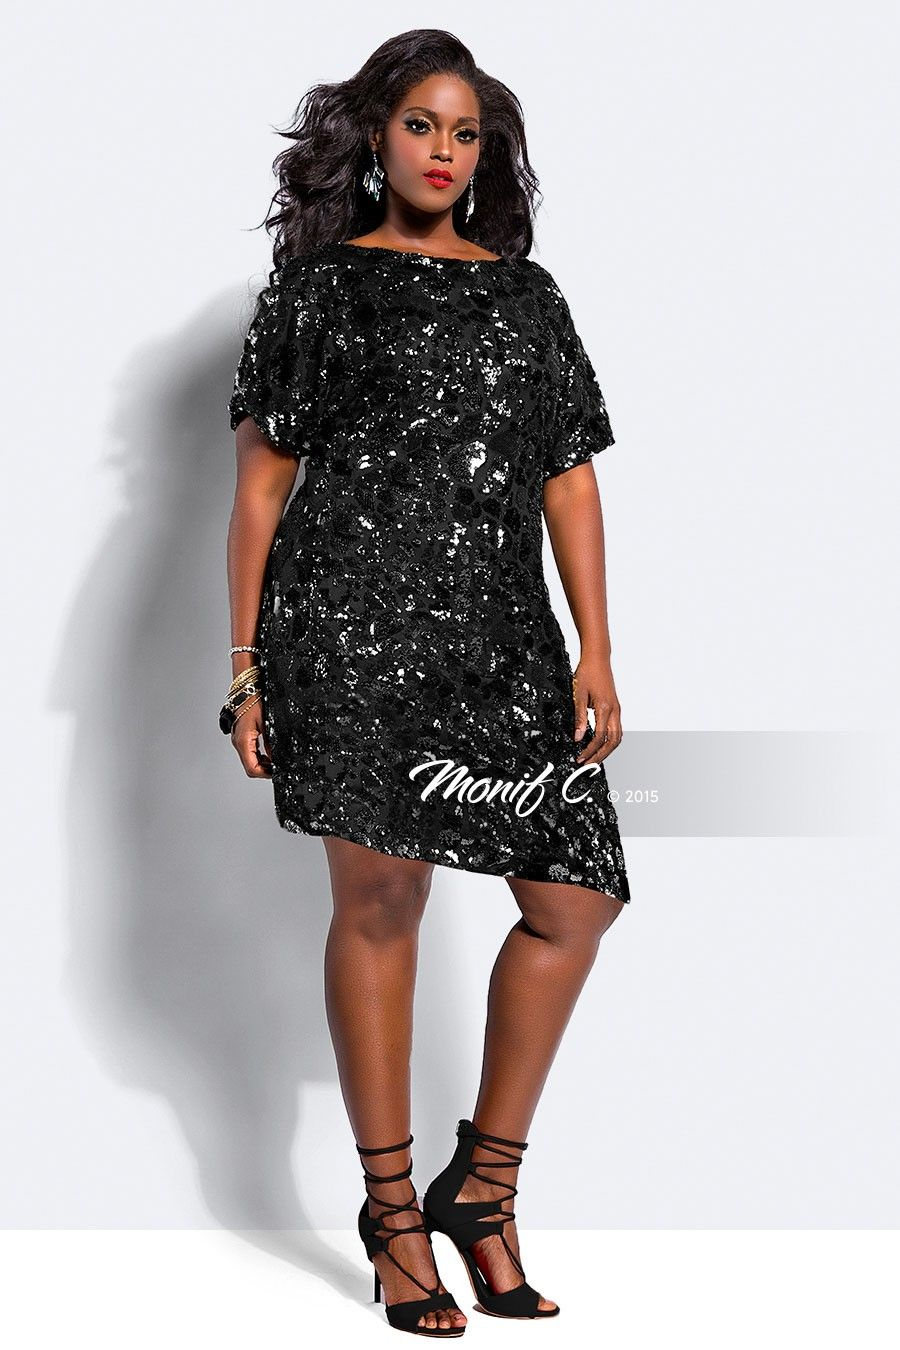 Plus Size Dress - Monif C - Plus Size Clothing   Plus Size Fashion ...